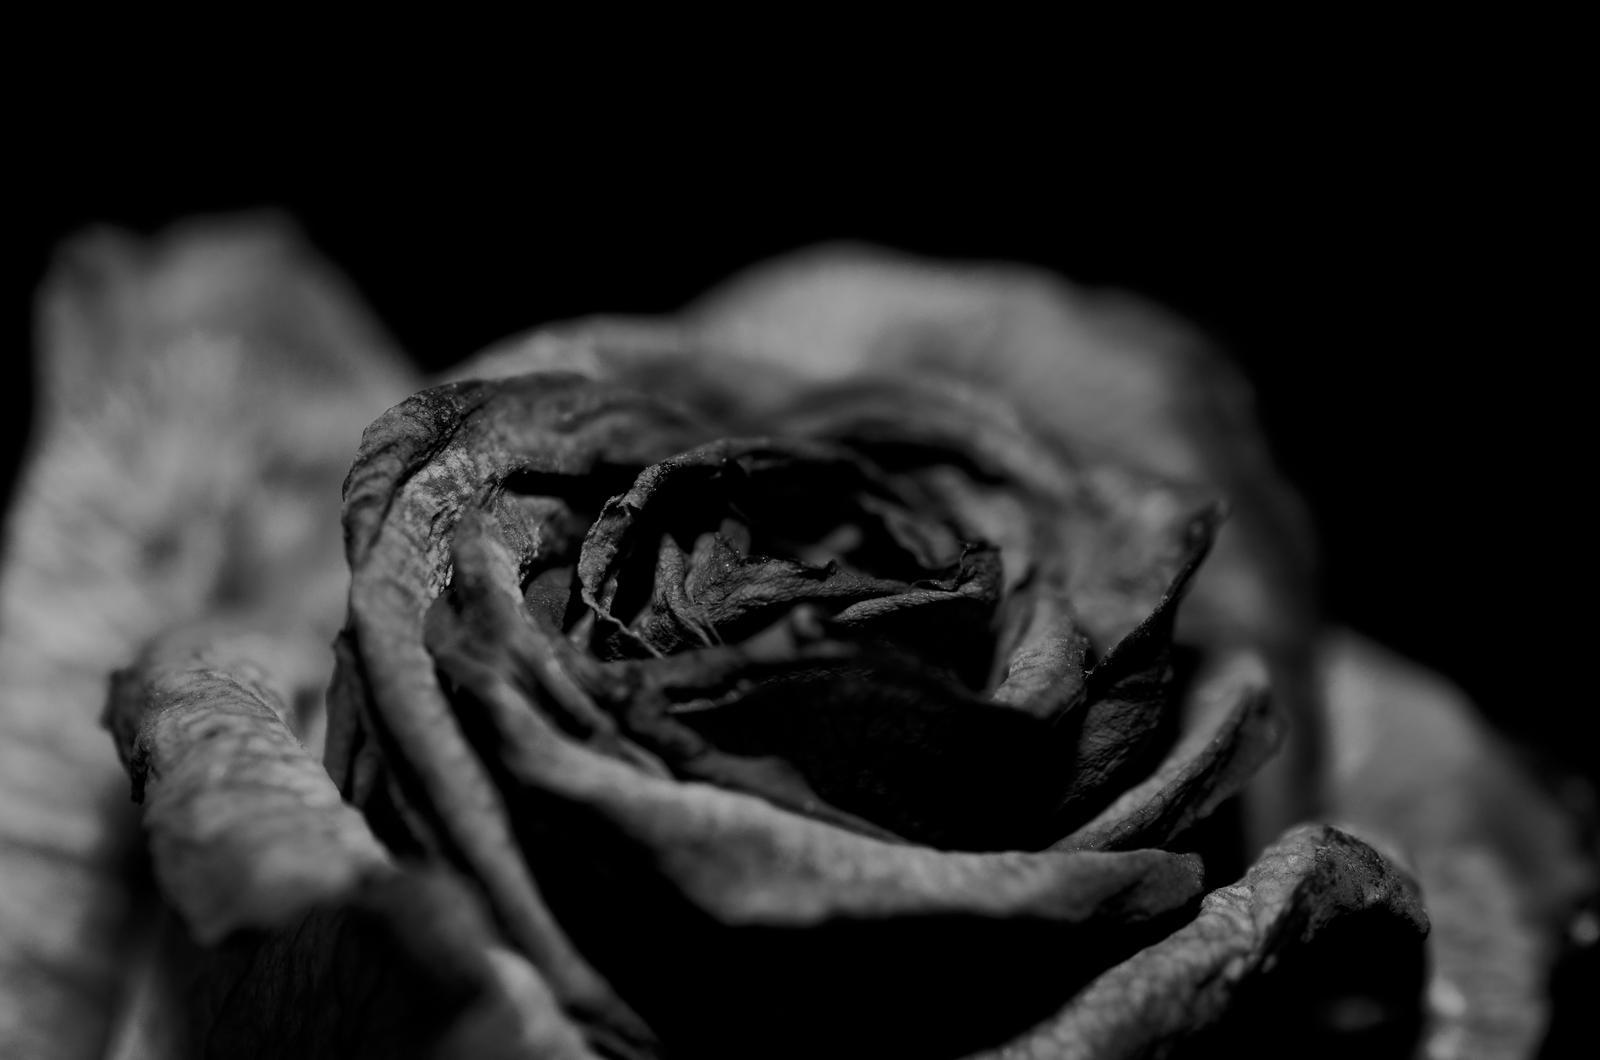 Black Roses Wallpaper Tumblr